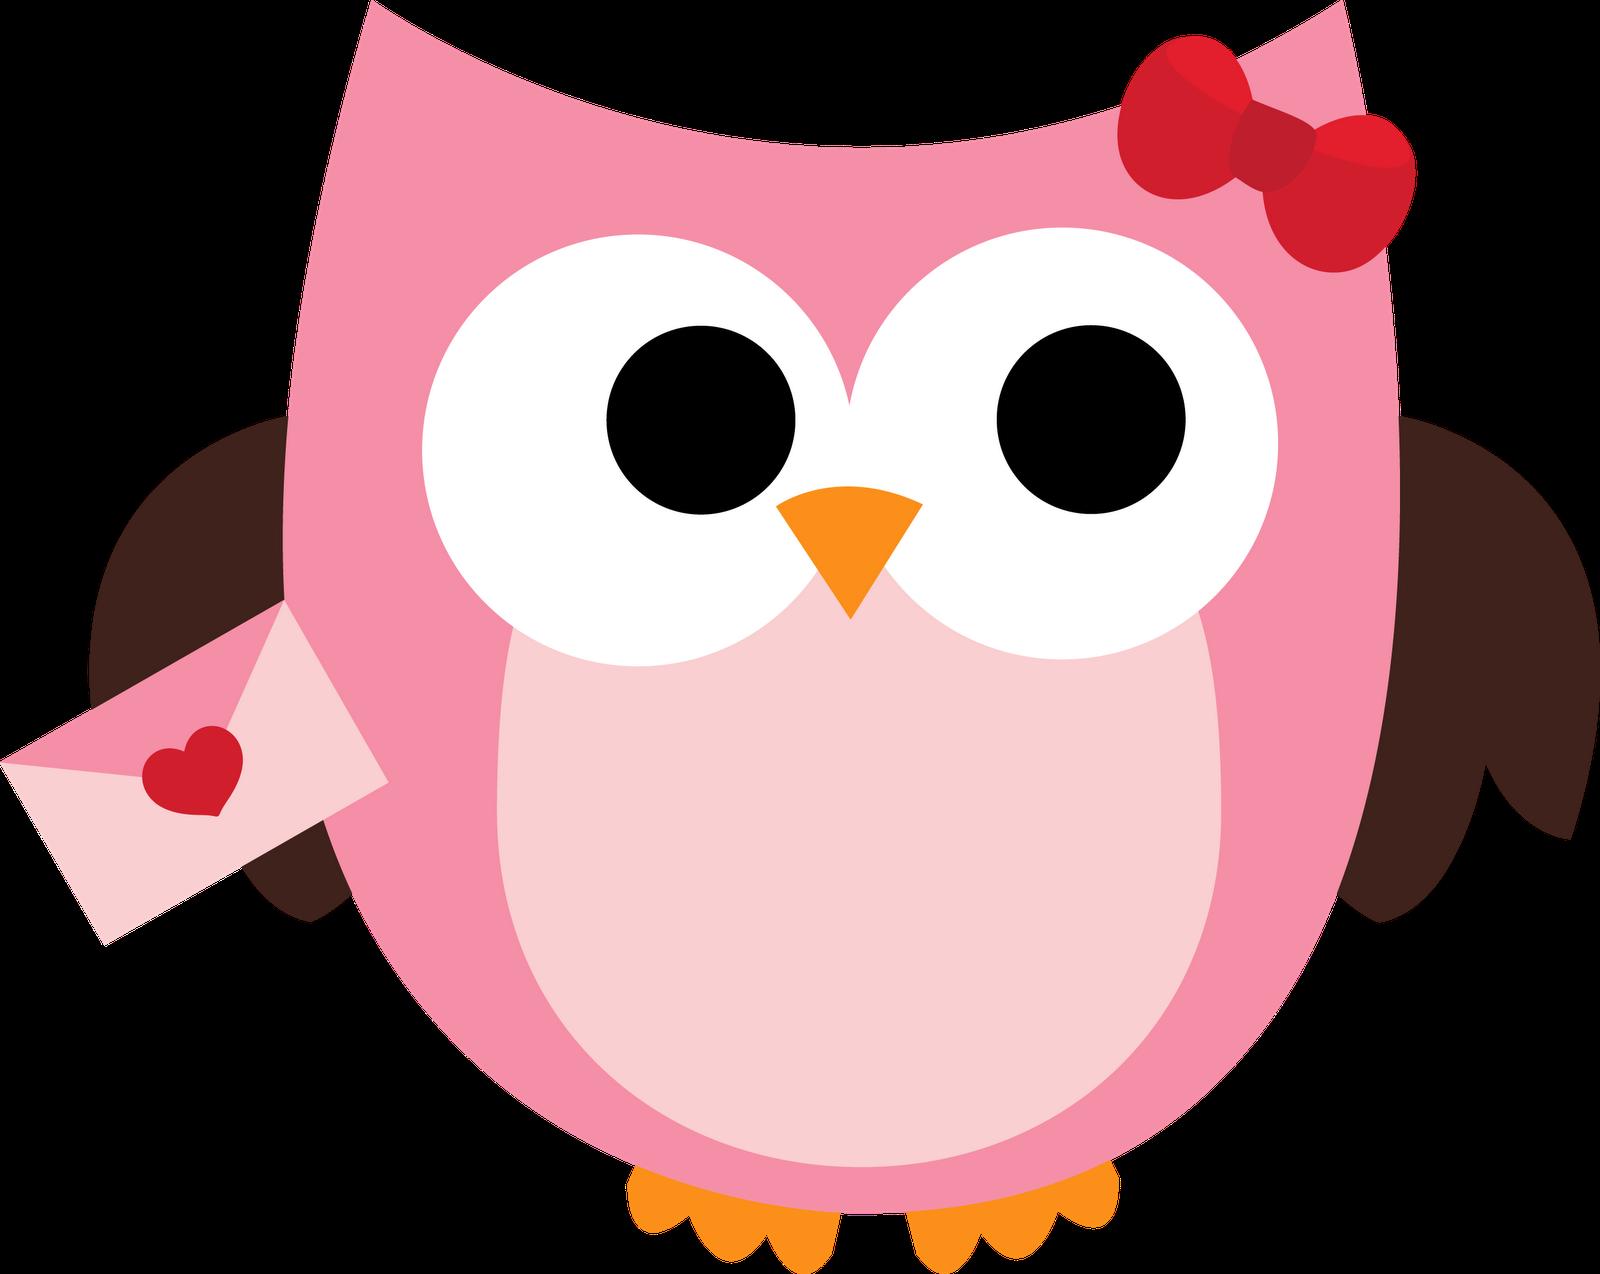 Clip Art Cute Owl Clipart 2 .-Clip art cute owl clipart 2 .-2